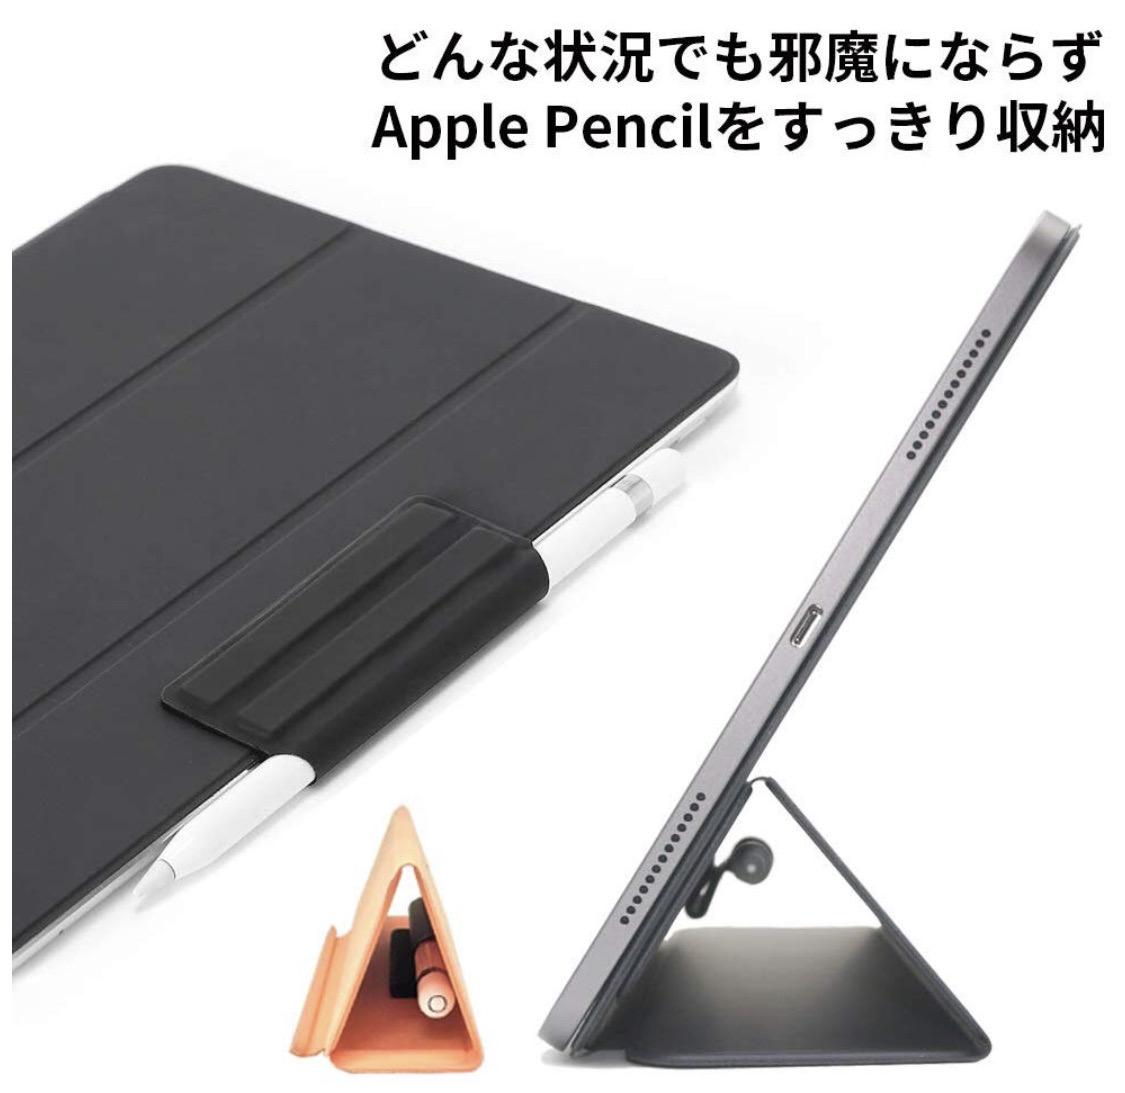 【Apple Pencil 1/2専用】 In-line Apple Pencil専用 マグネットホルダー −5